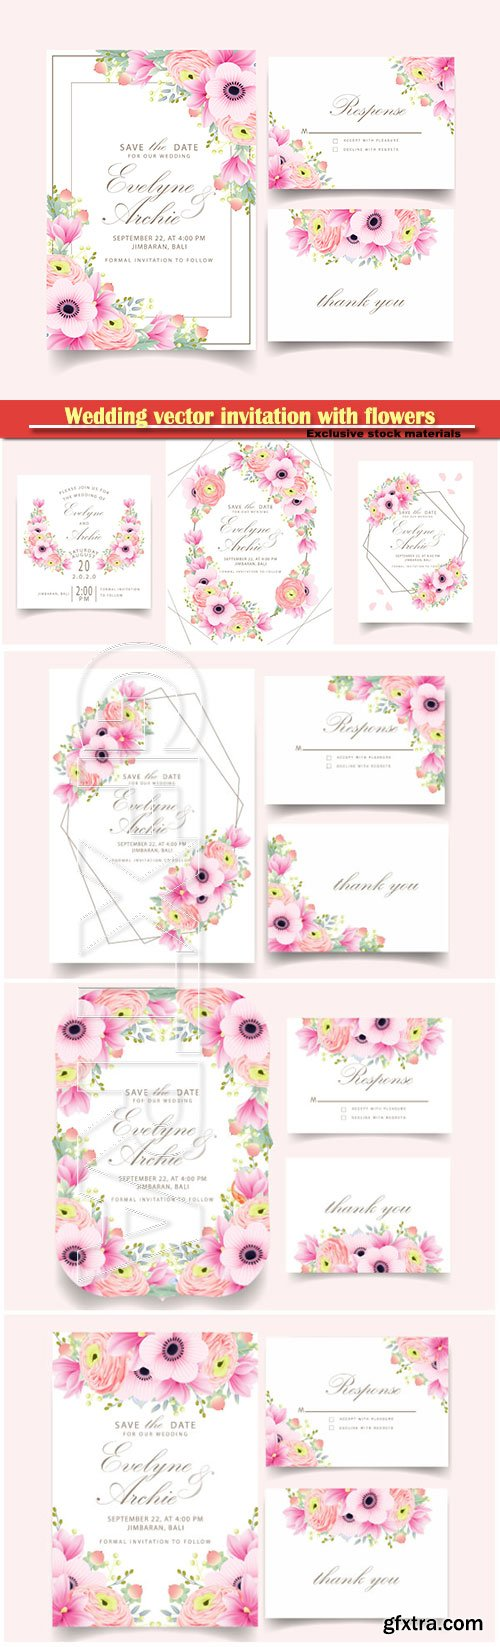 Wedding vector invitation with beautiful flowers